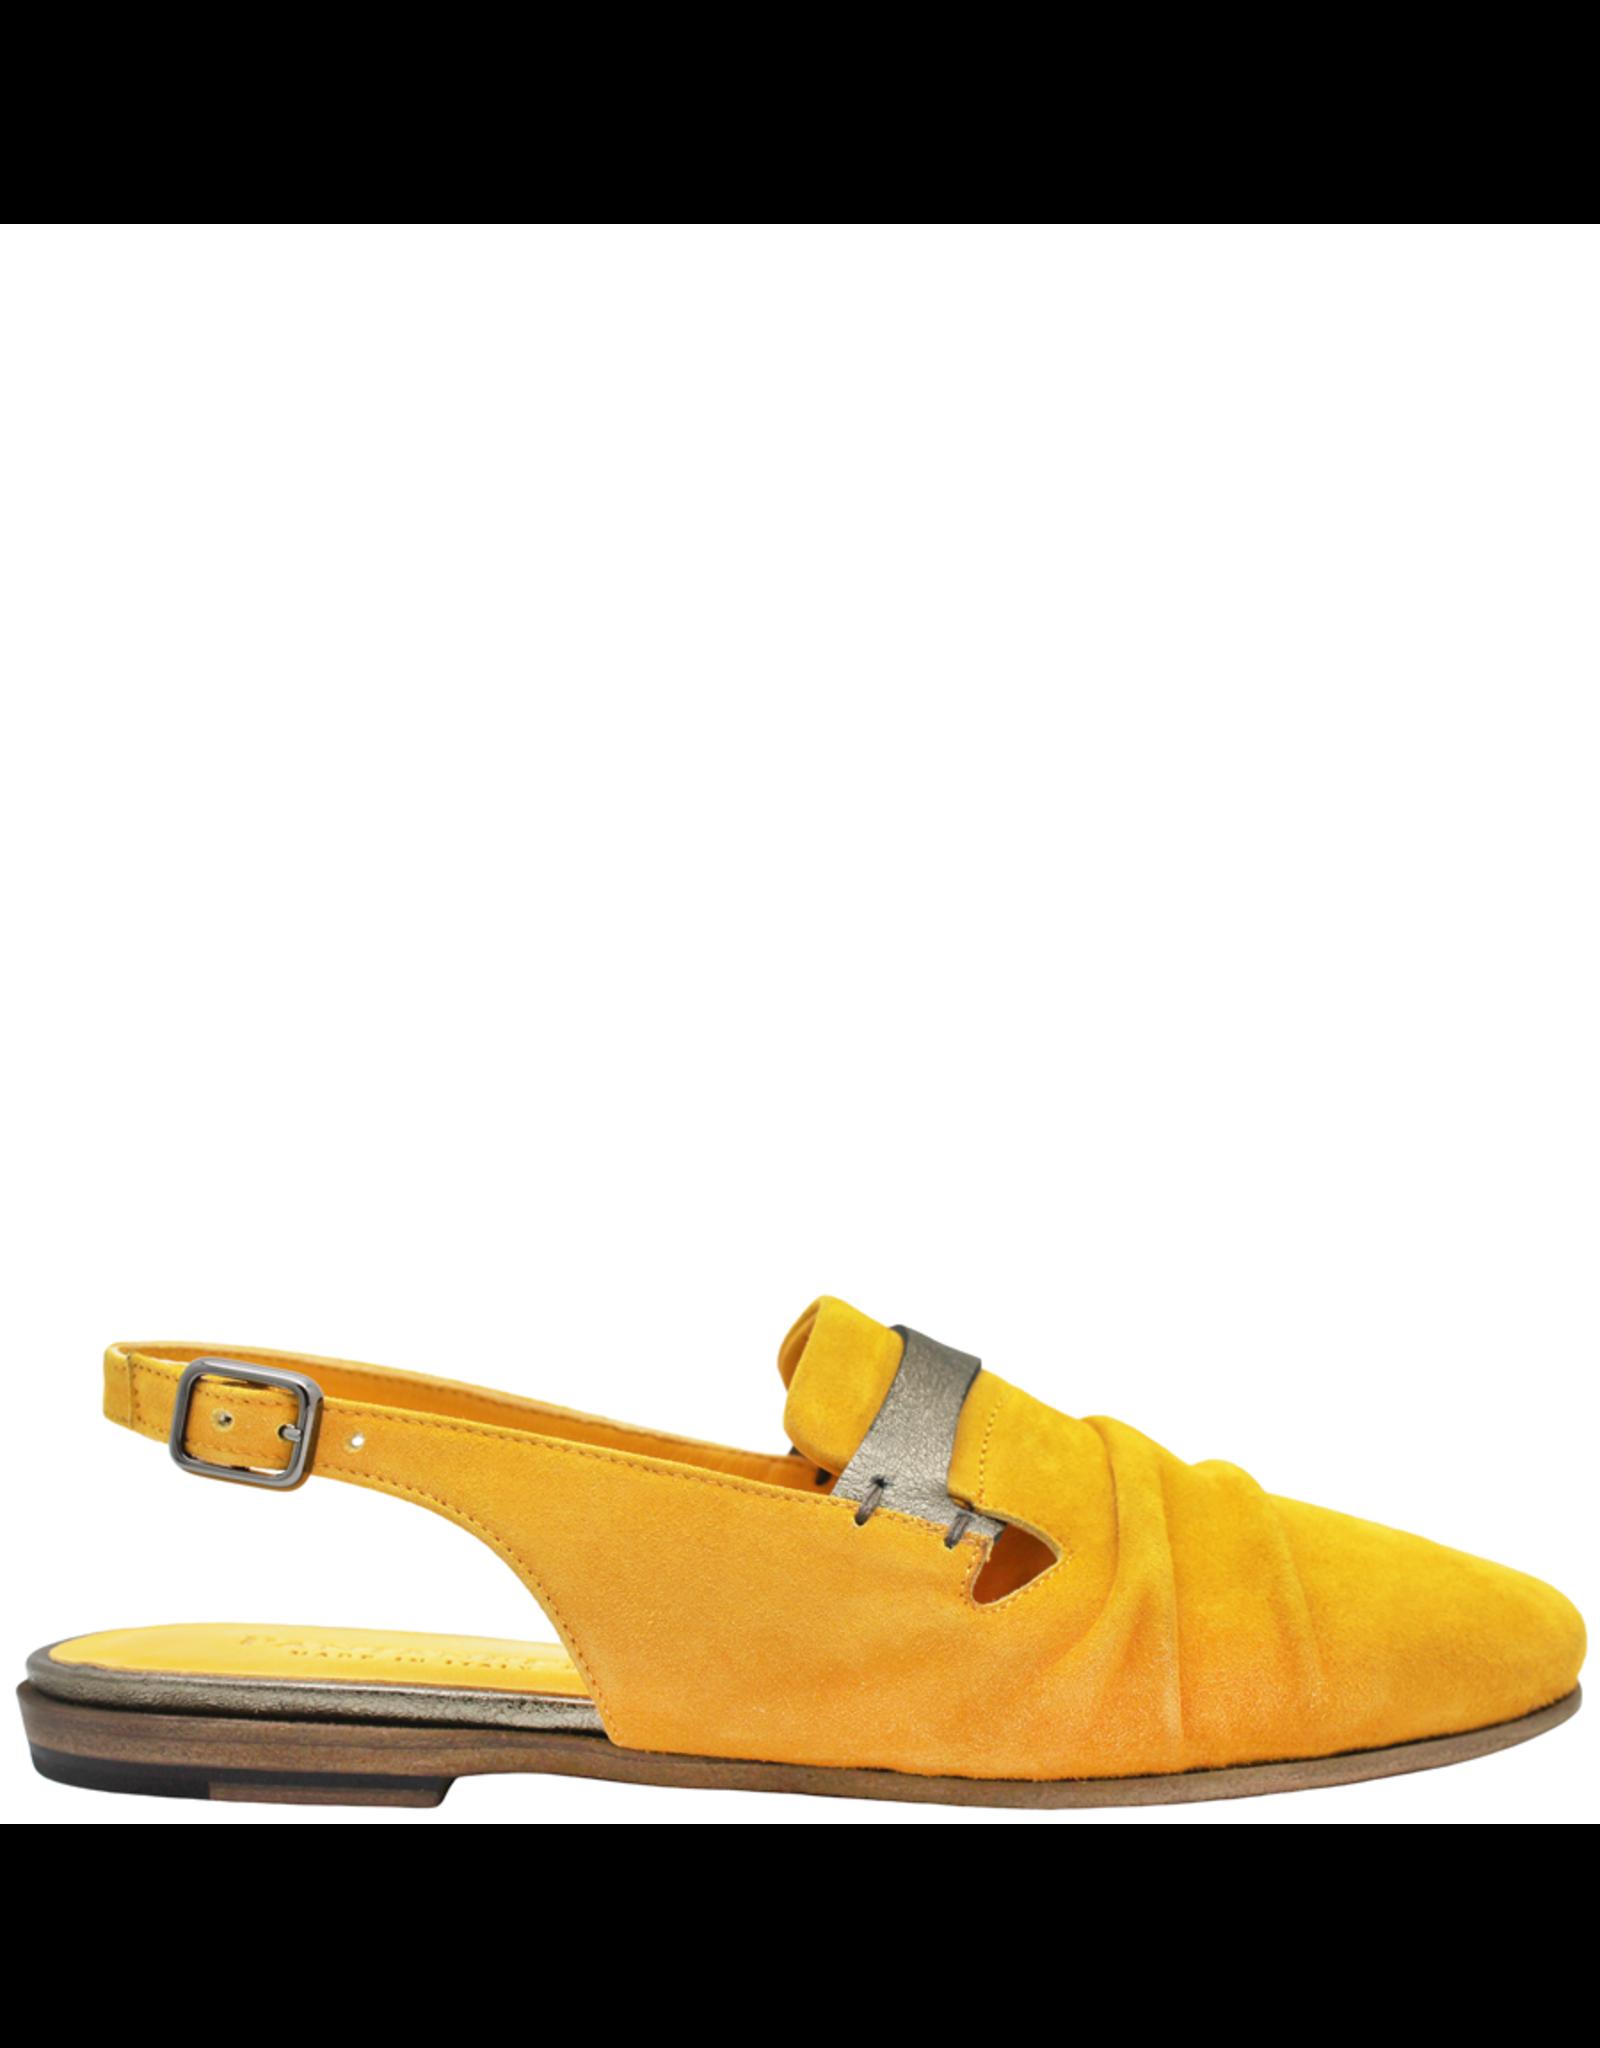 Pantanetti Pantanetti Yellow Suede Sling Flat Loafers 1224